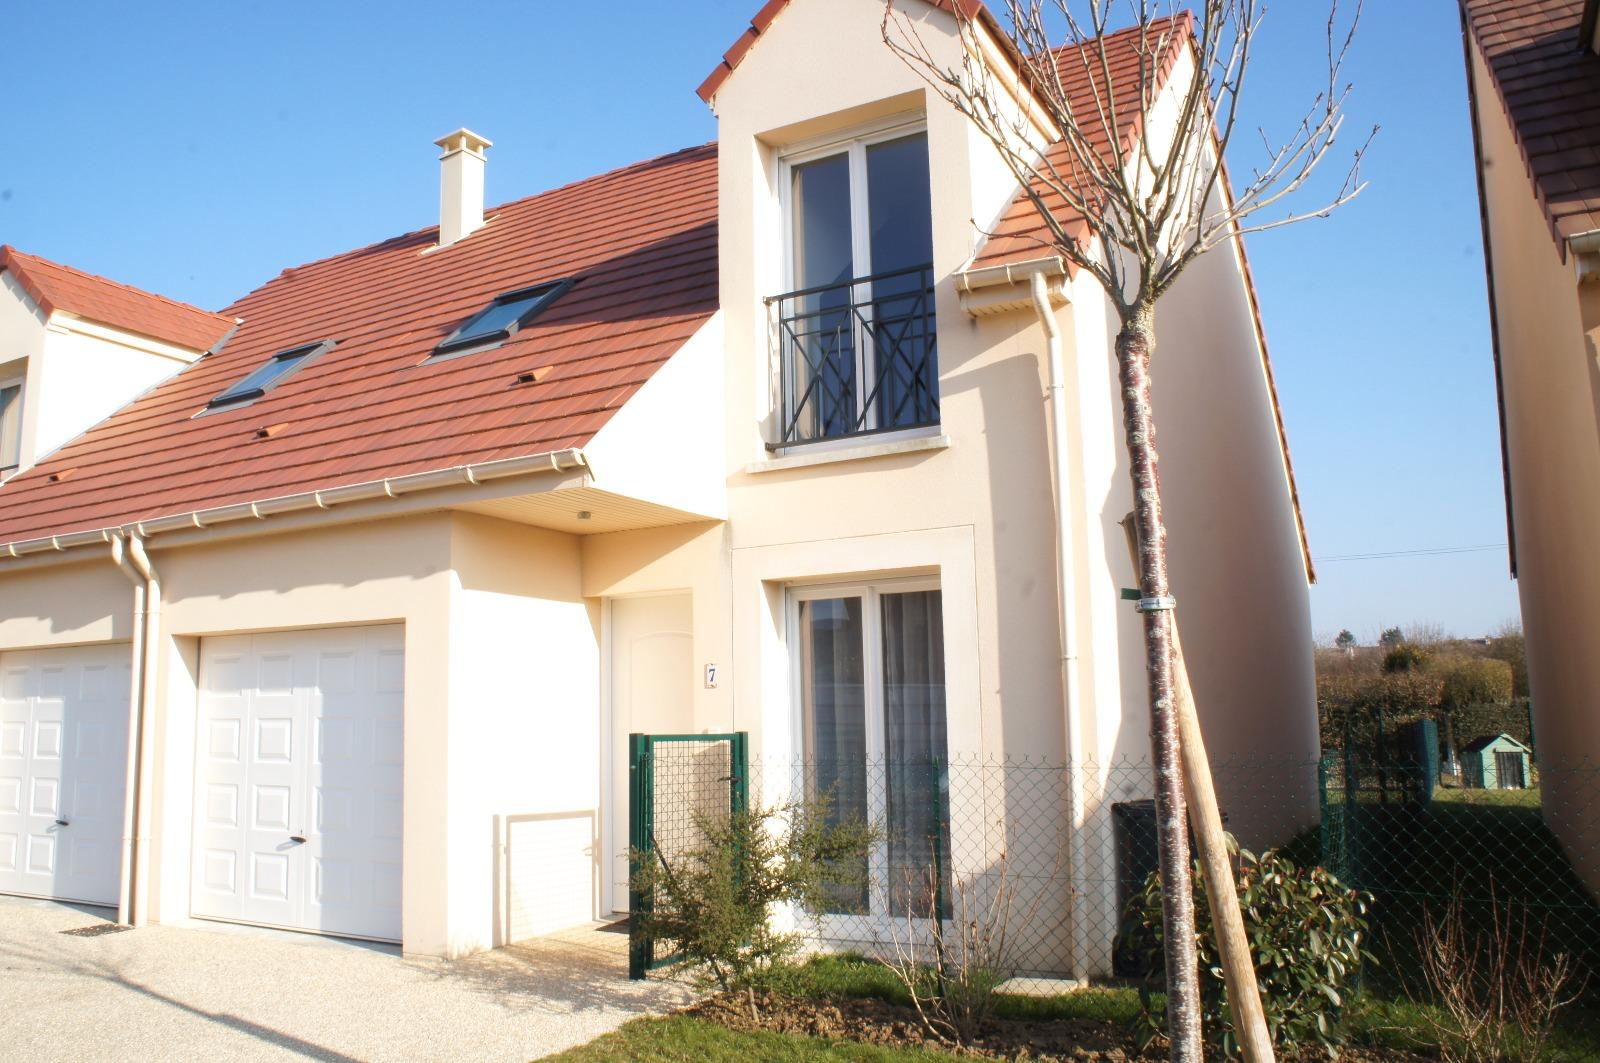 Agence immobiliere breuillet 91 for Breuillet 91